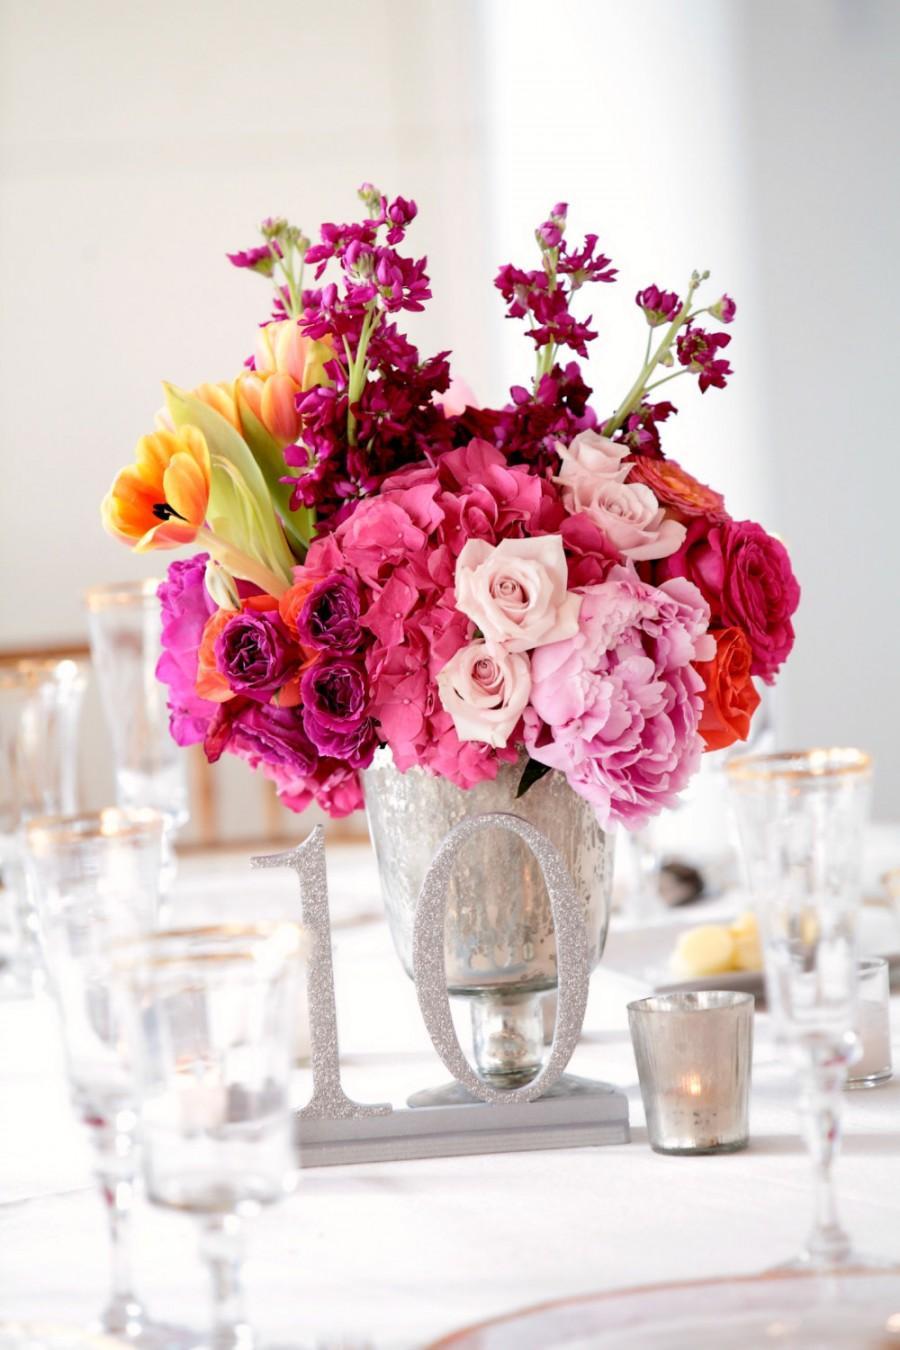 Свадьба - 1-5 Silver Glitter Wooden Wedding Table Numbers, Silver Table Numbers, Glittered Table Numbers